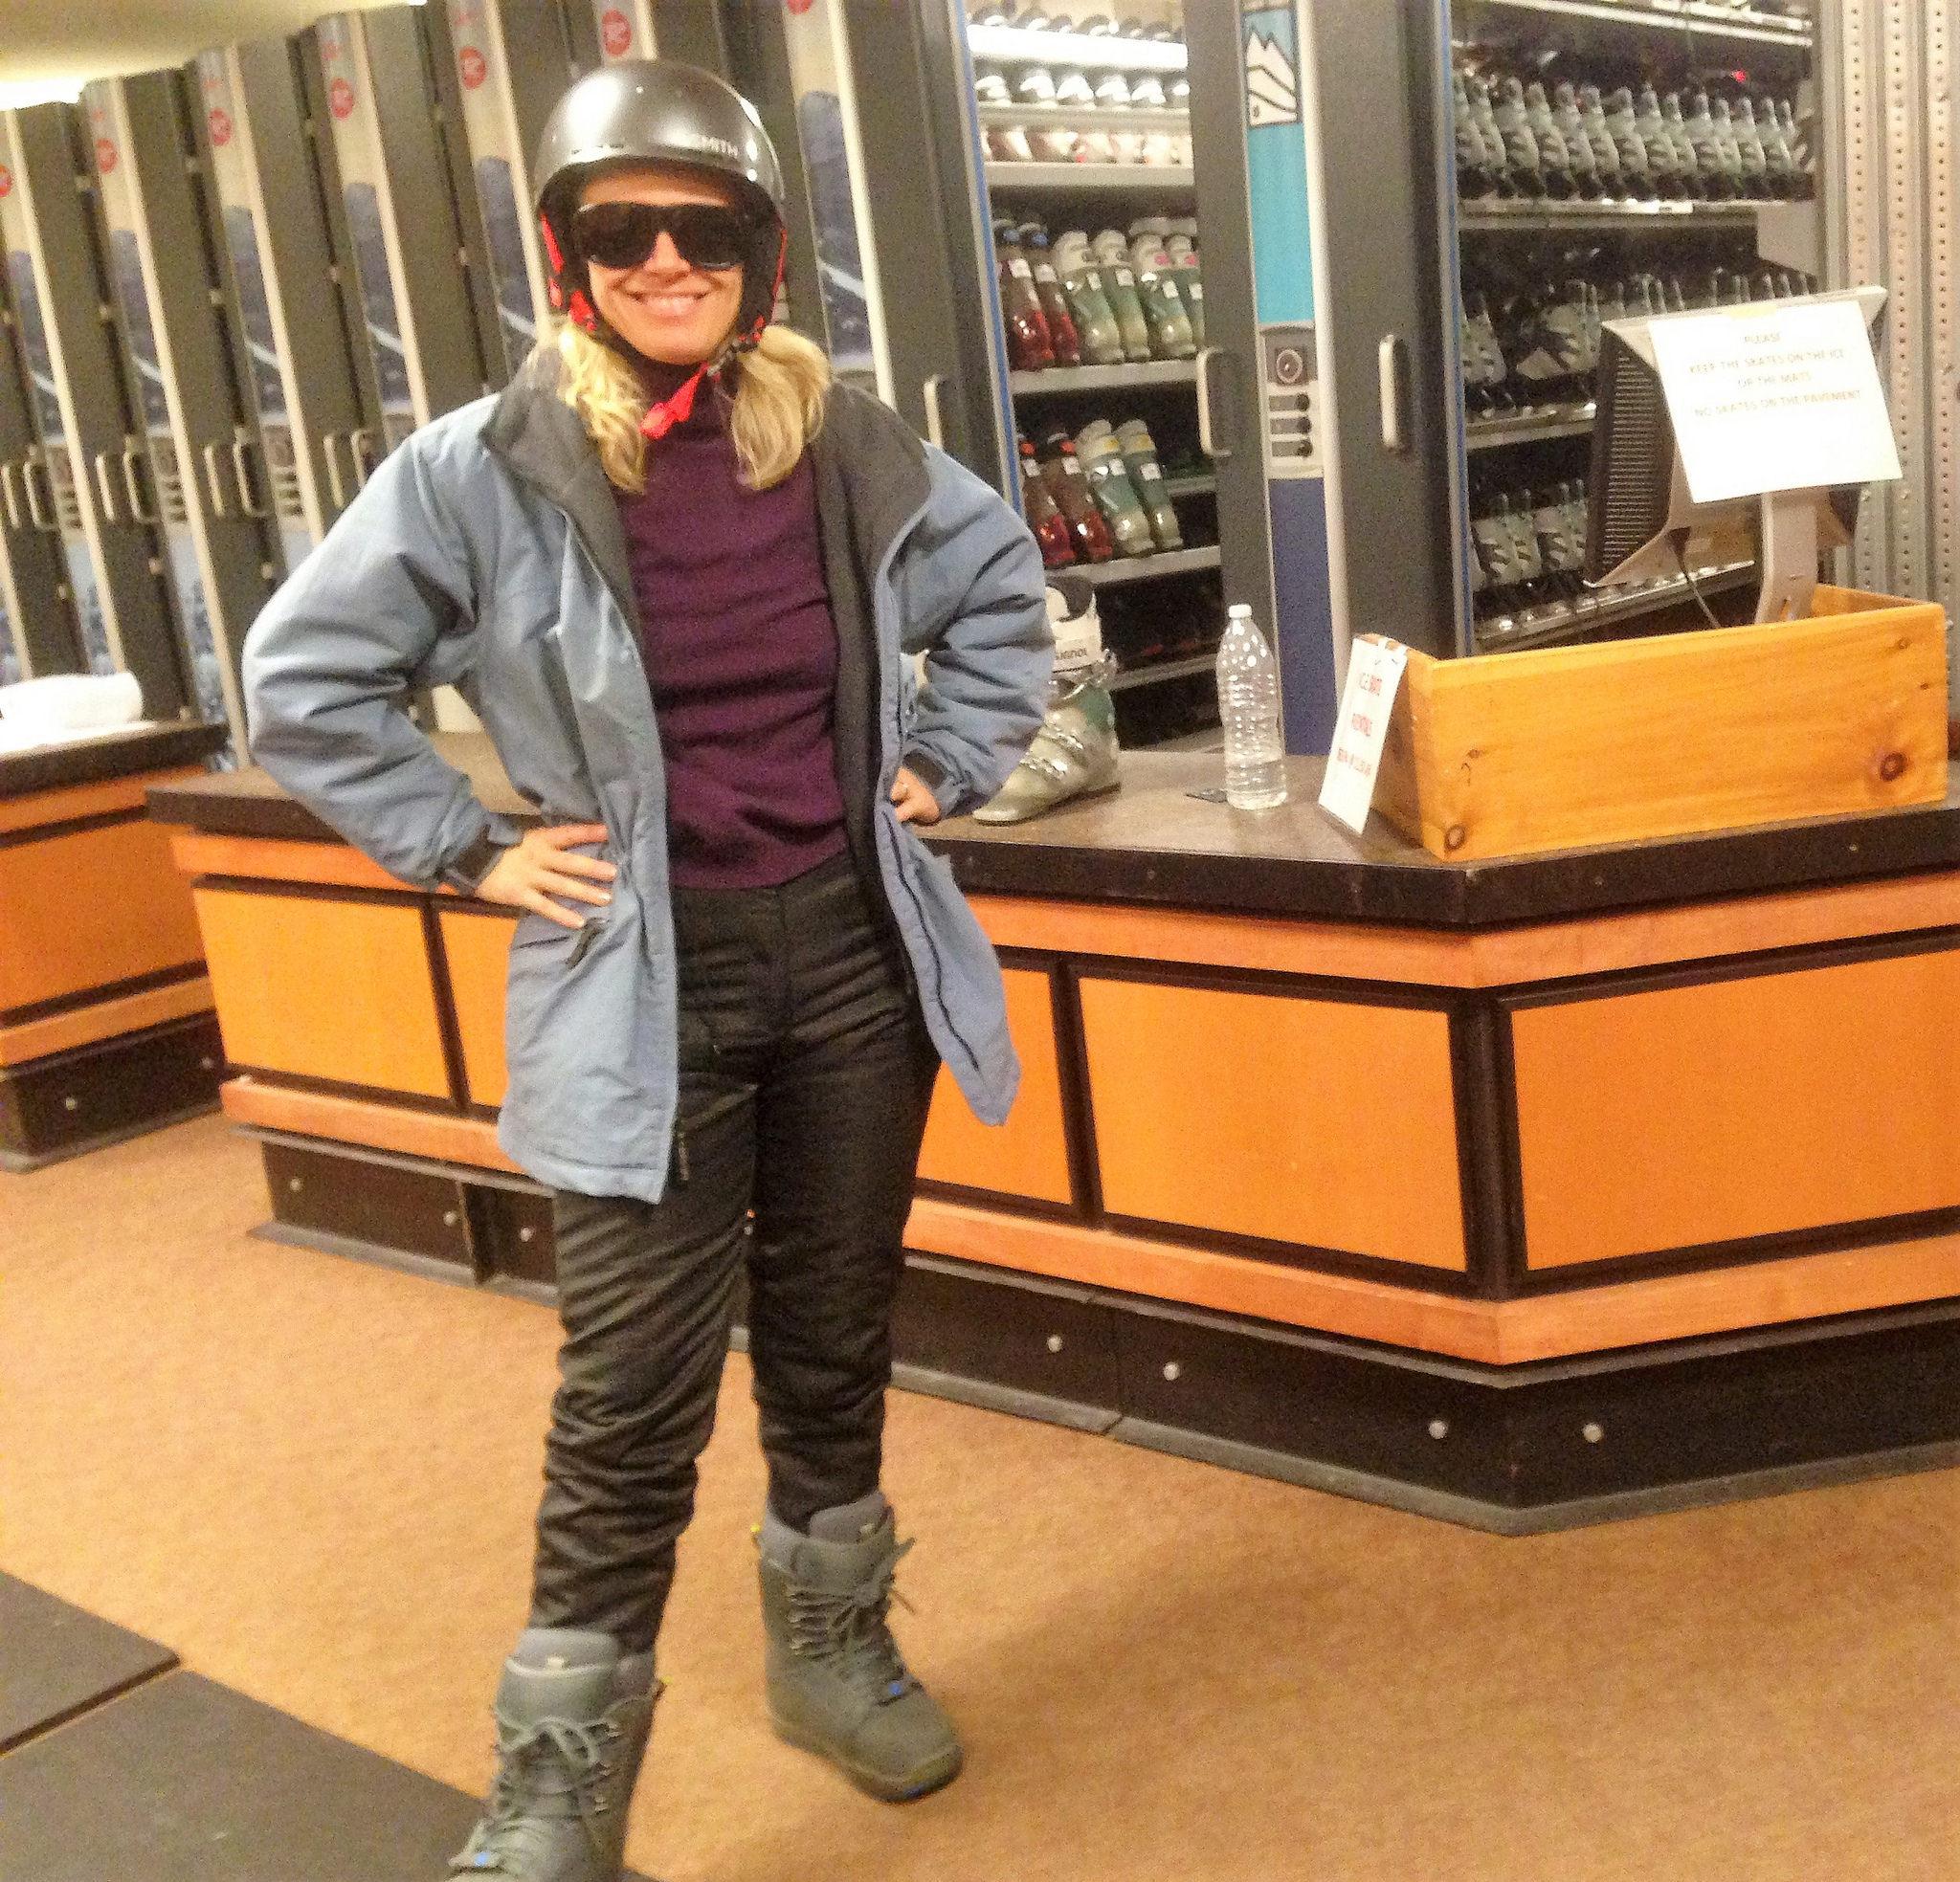 sowboarding in vermont - Stowe Ski Resort